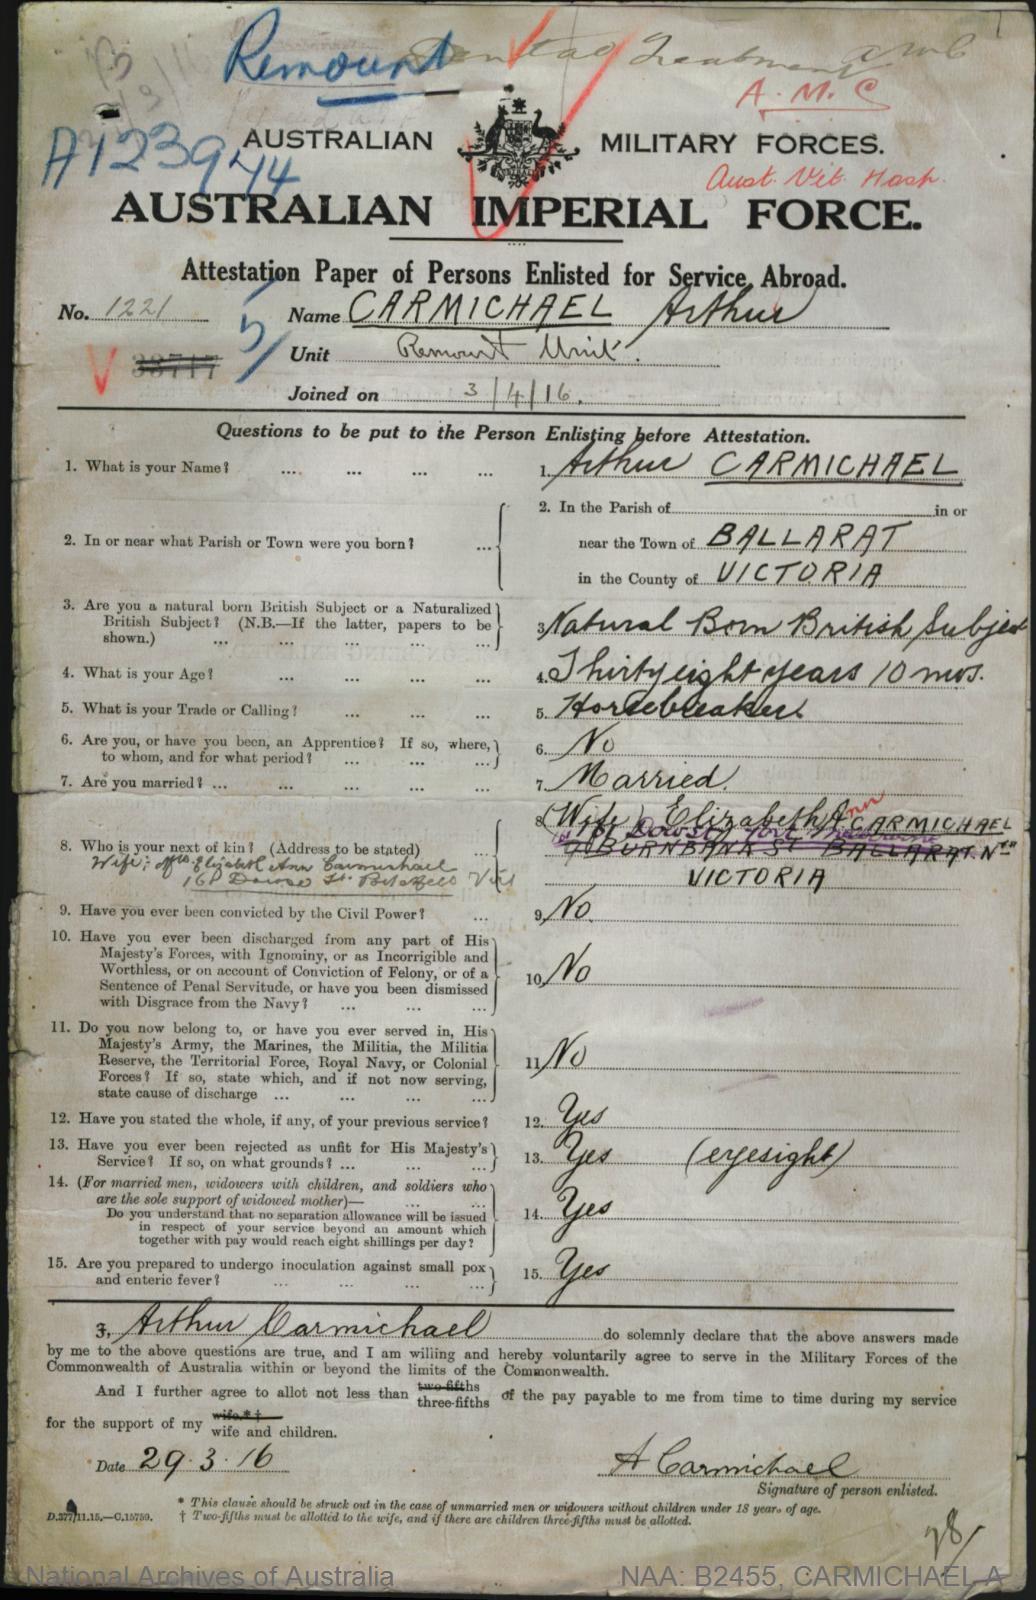 Carmichael Arthur : SERN 1221 : POB Ballarat VIC : POE Melbourne VIC : NOK W Carmichael Elizabeth Ann